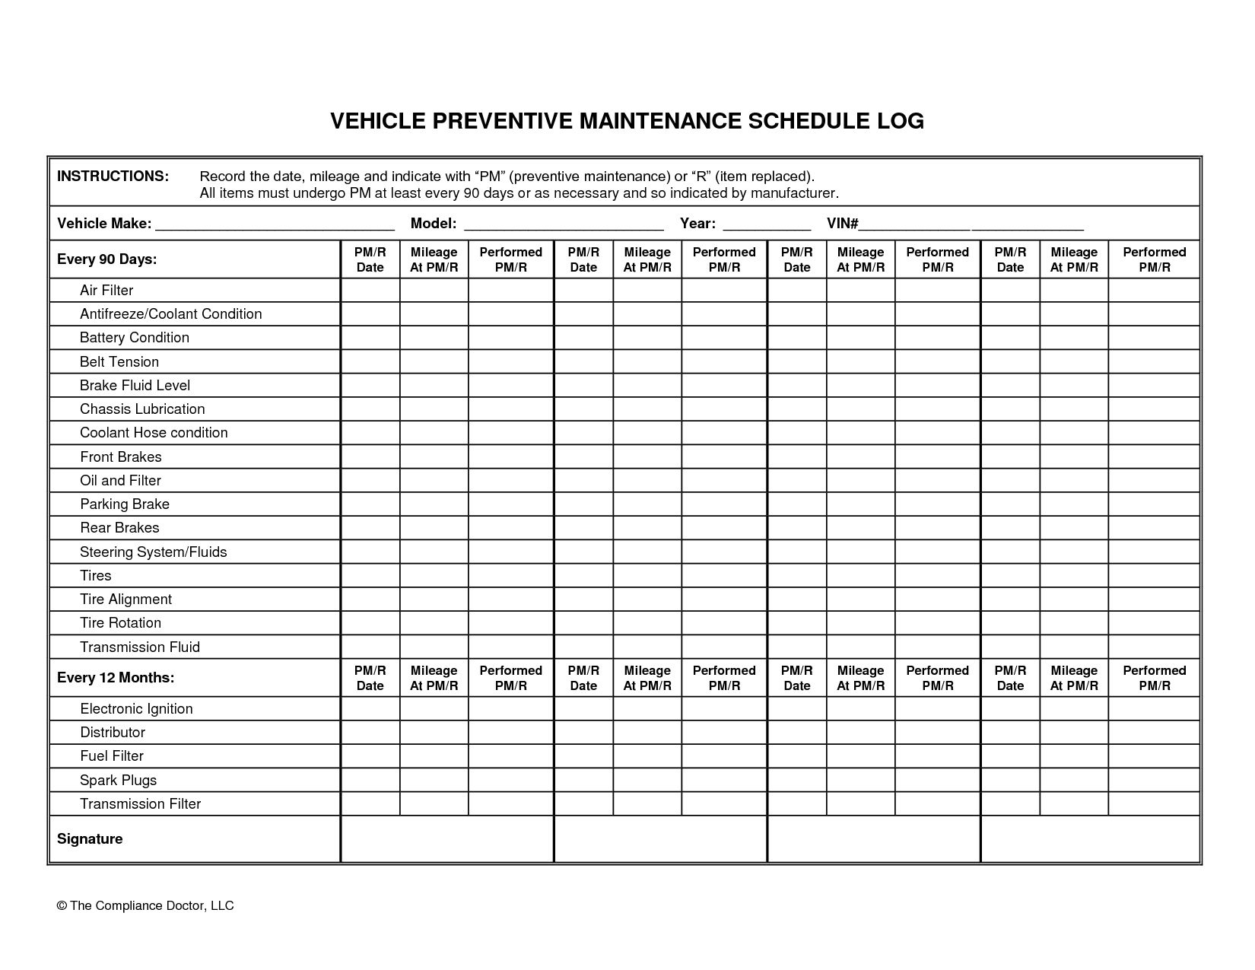 Equipment Maintenance Schedule Spreadsheet Intended For Equipment Maintenance Log Template Excel Unique Maintenance Log